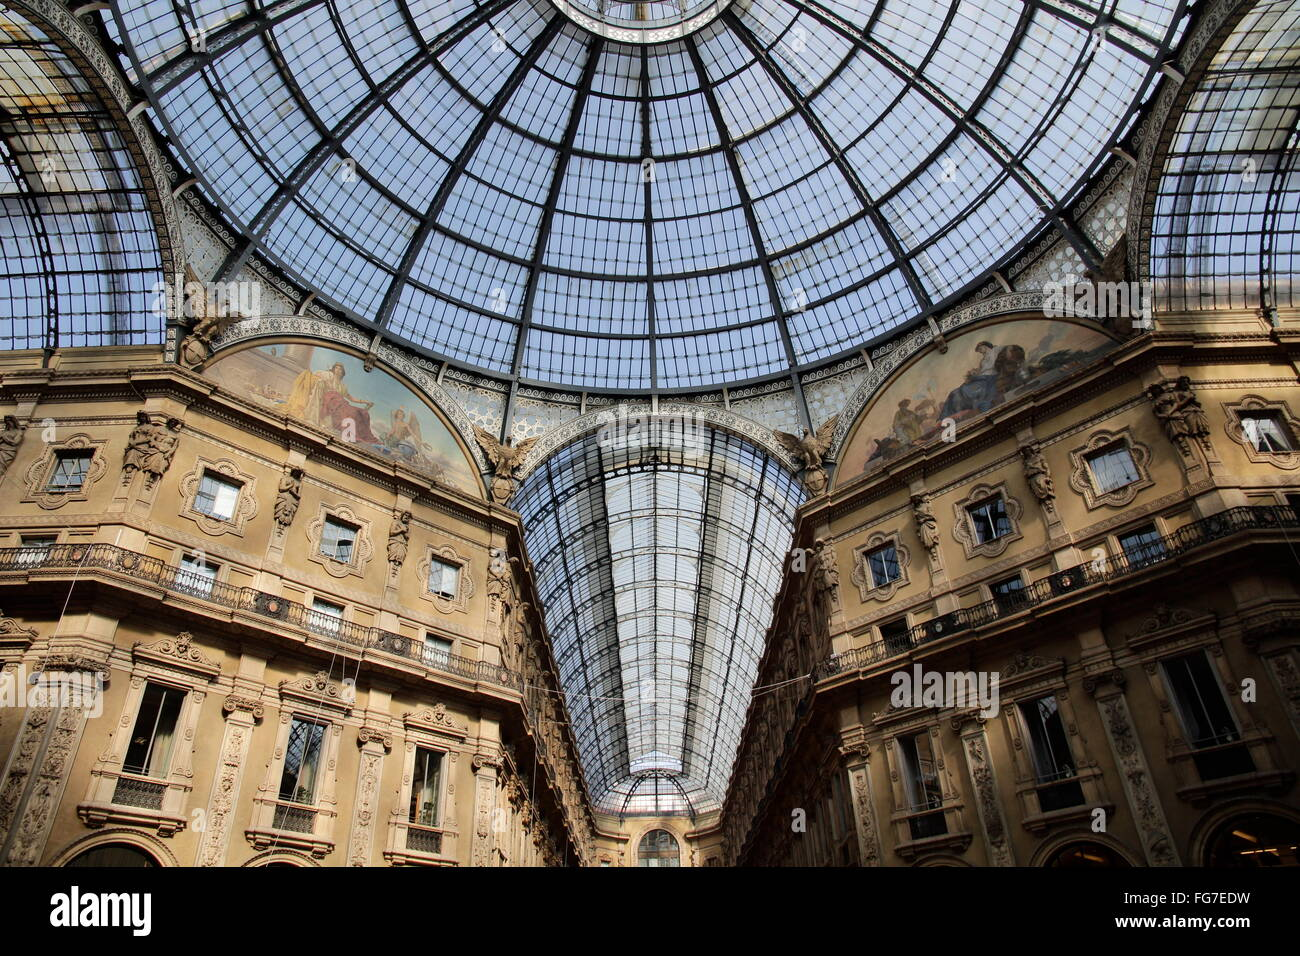 Geographie/Reisen, Italien, Lombardei, Mailand, Galleria Vittorio Emanuele II, Additional-Rights - Clearance-Info Stockbild